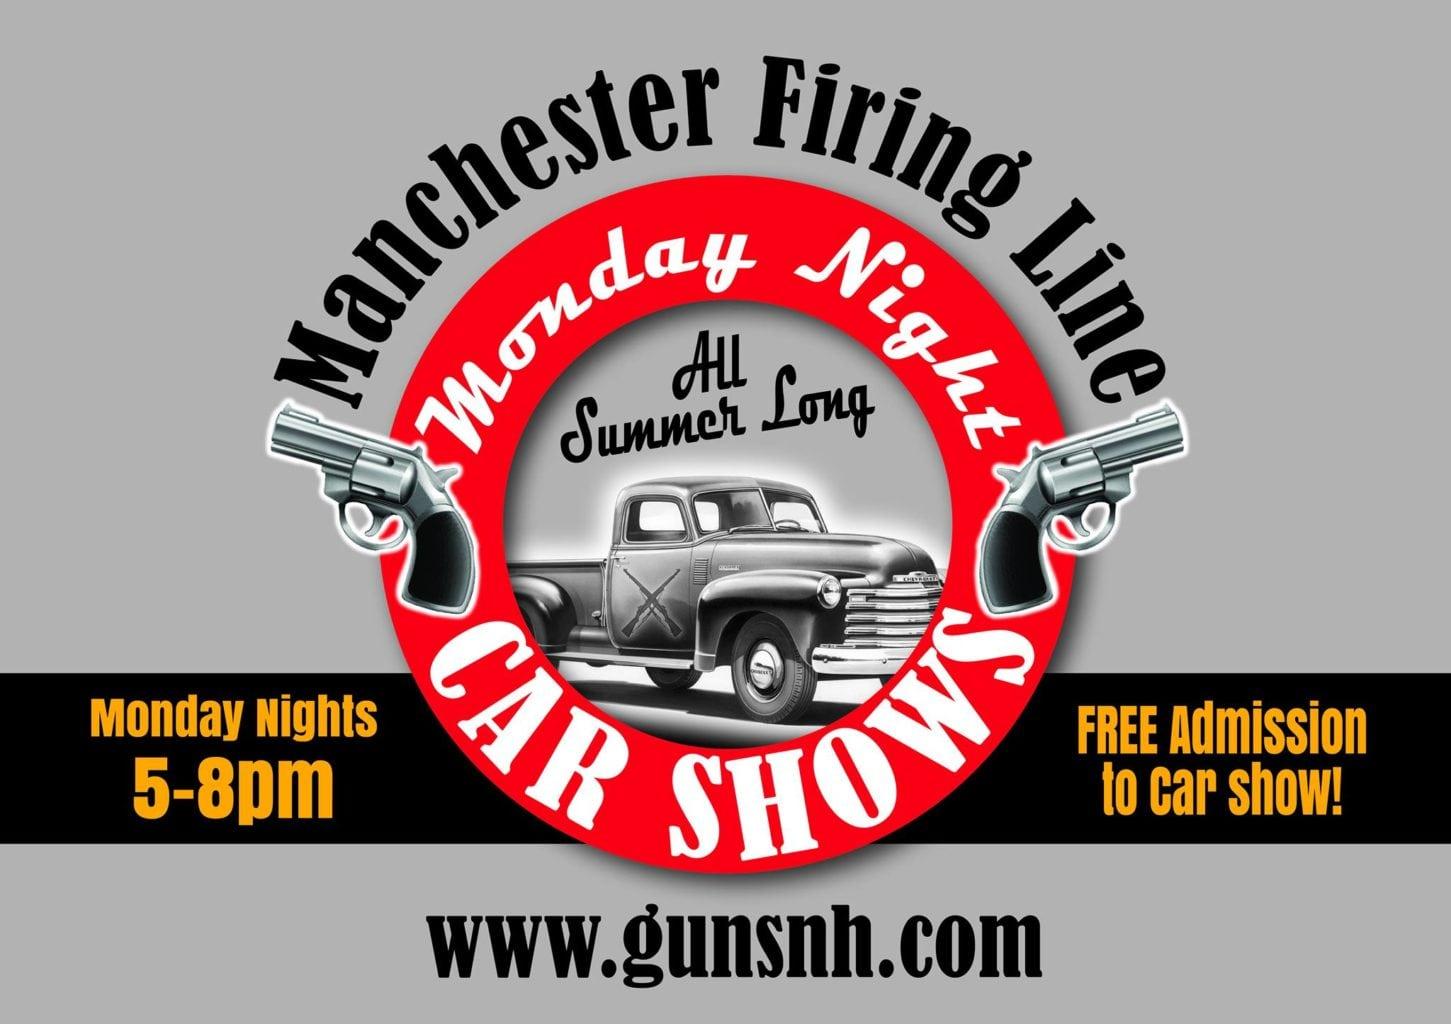 Manchester Nh Car Show